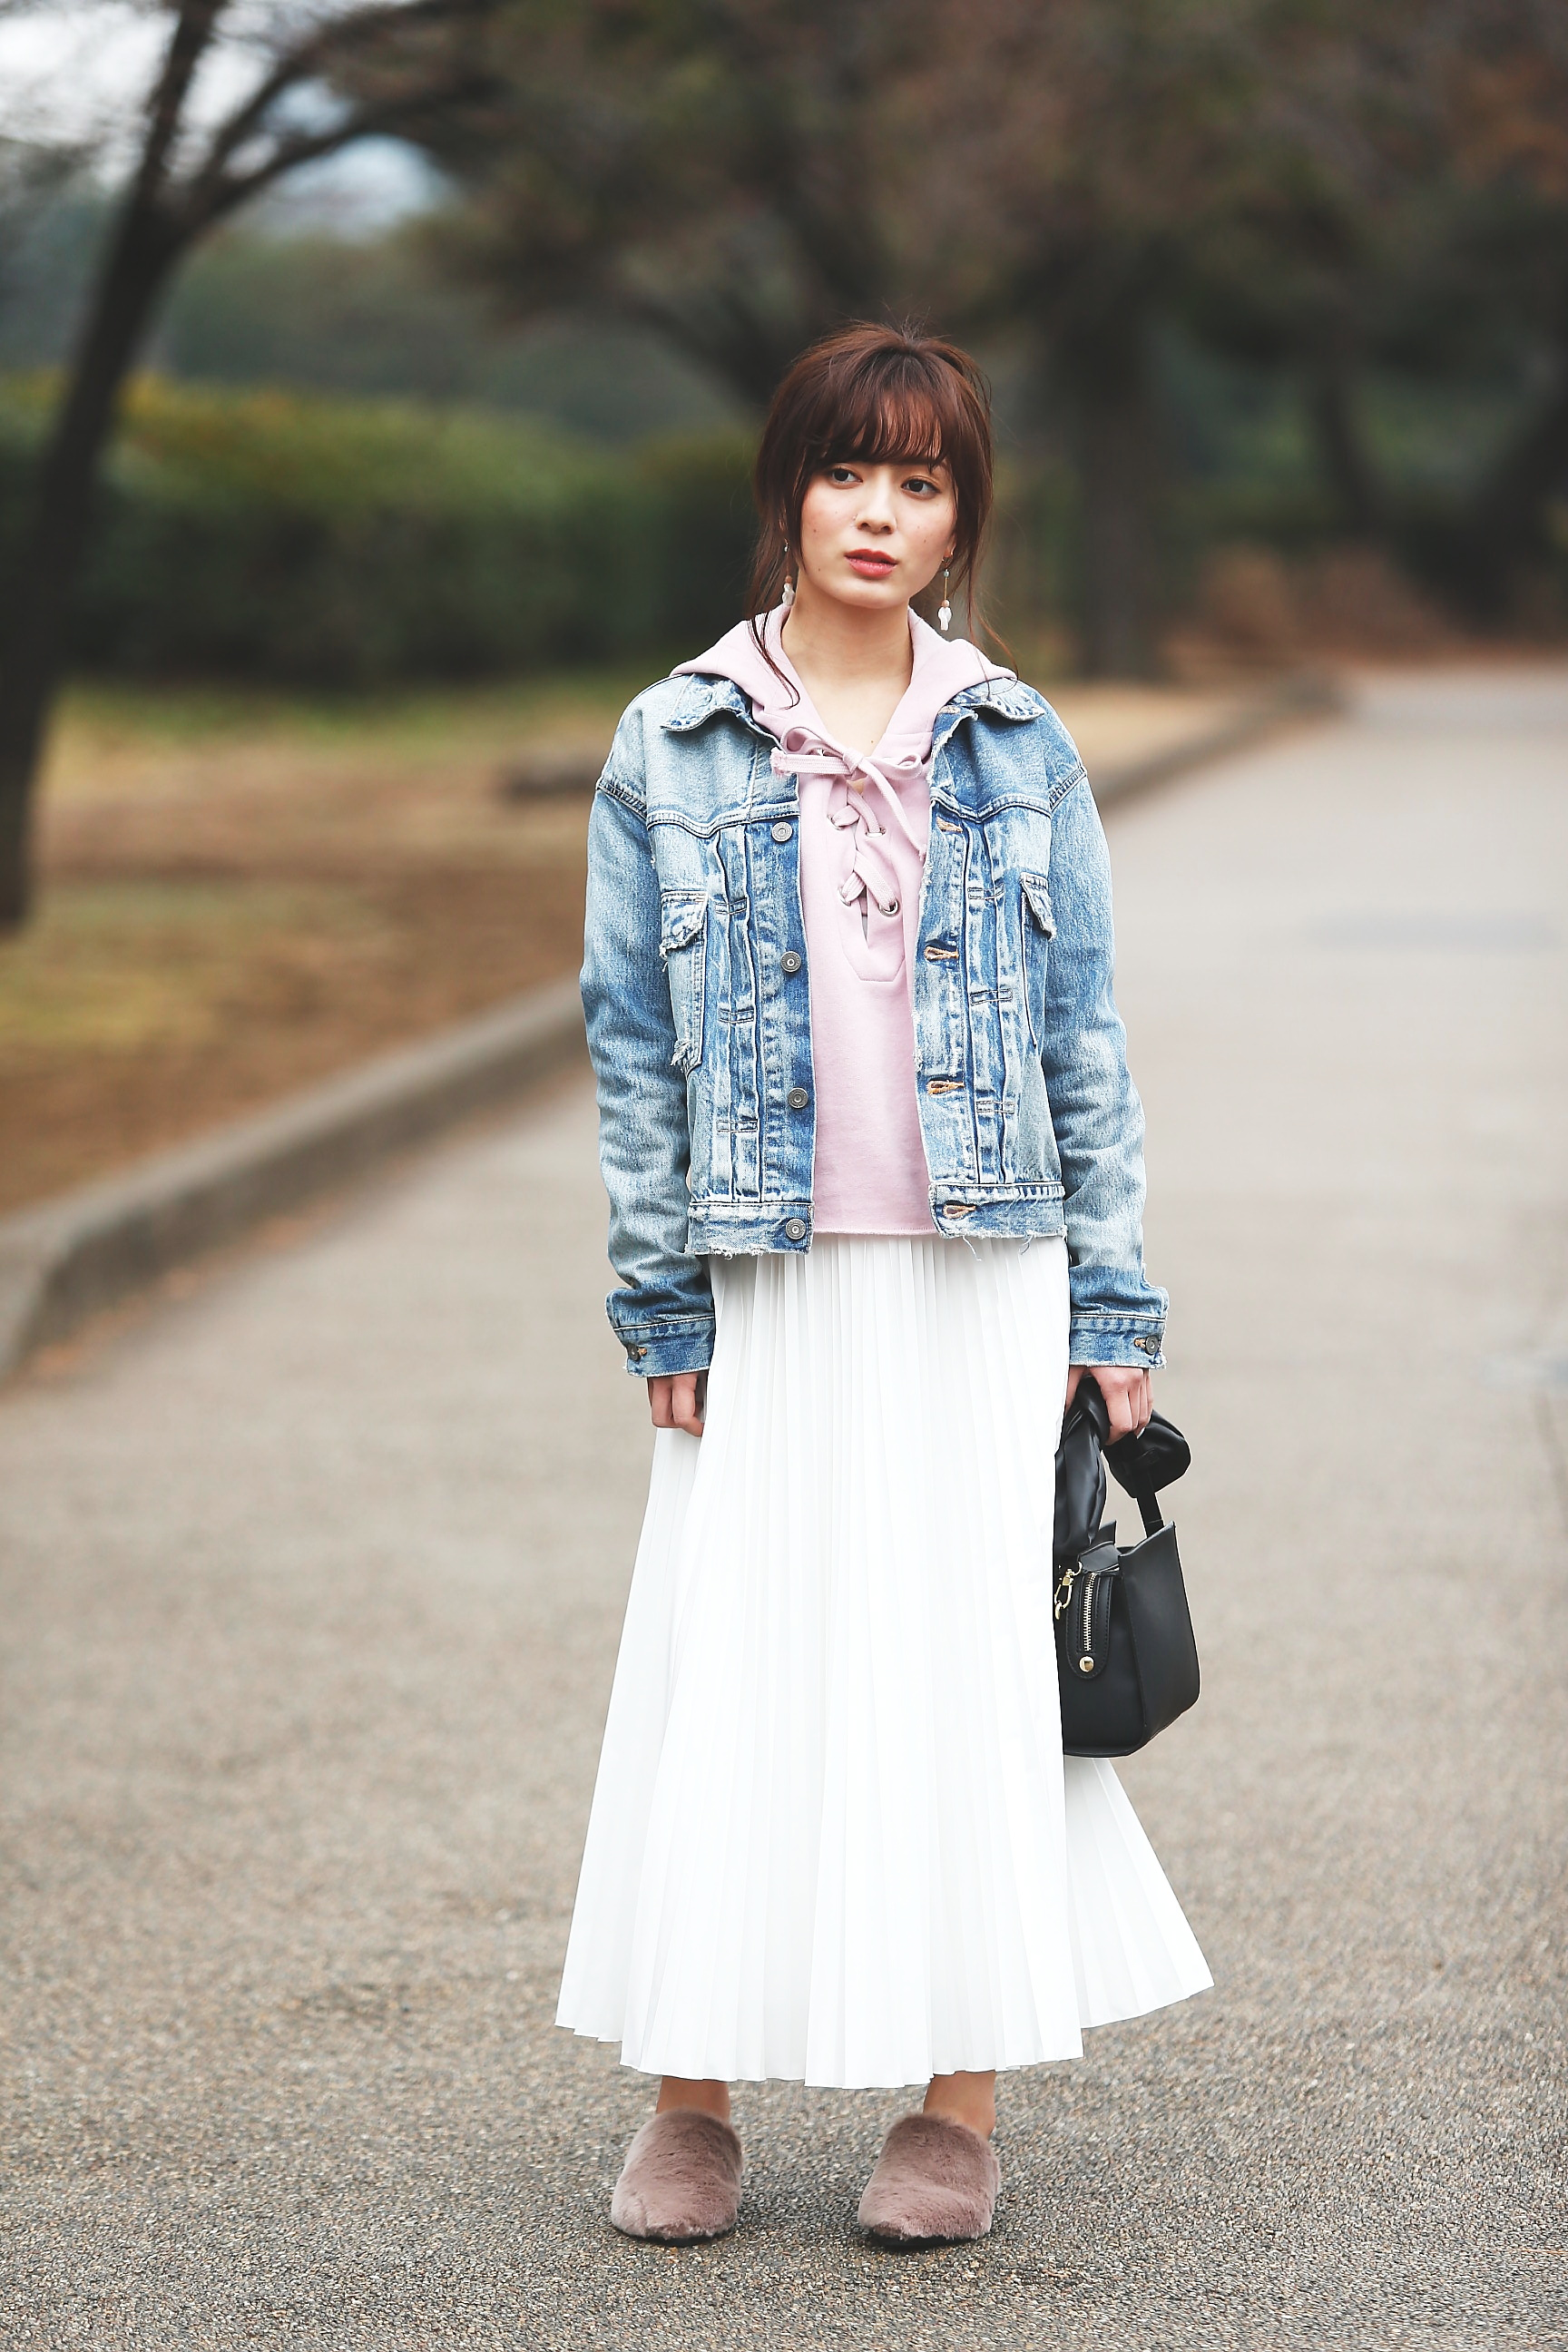 Gジャン×パーカー×白プリーツロングスカート